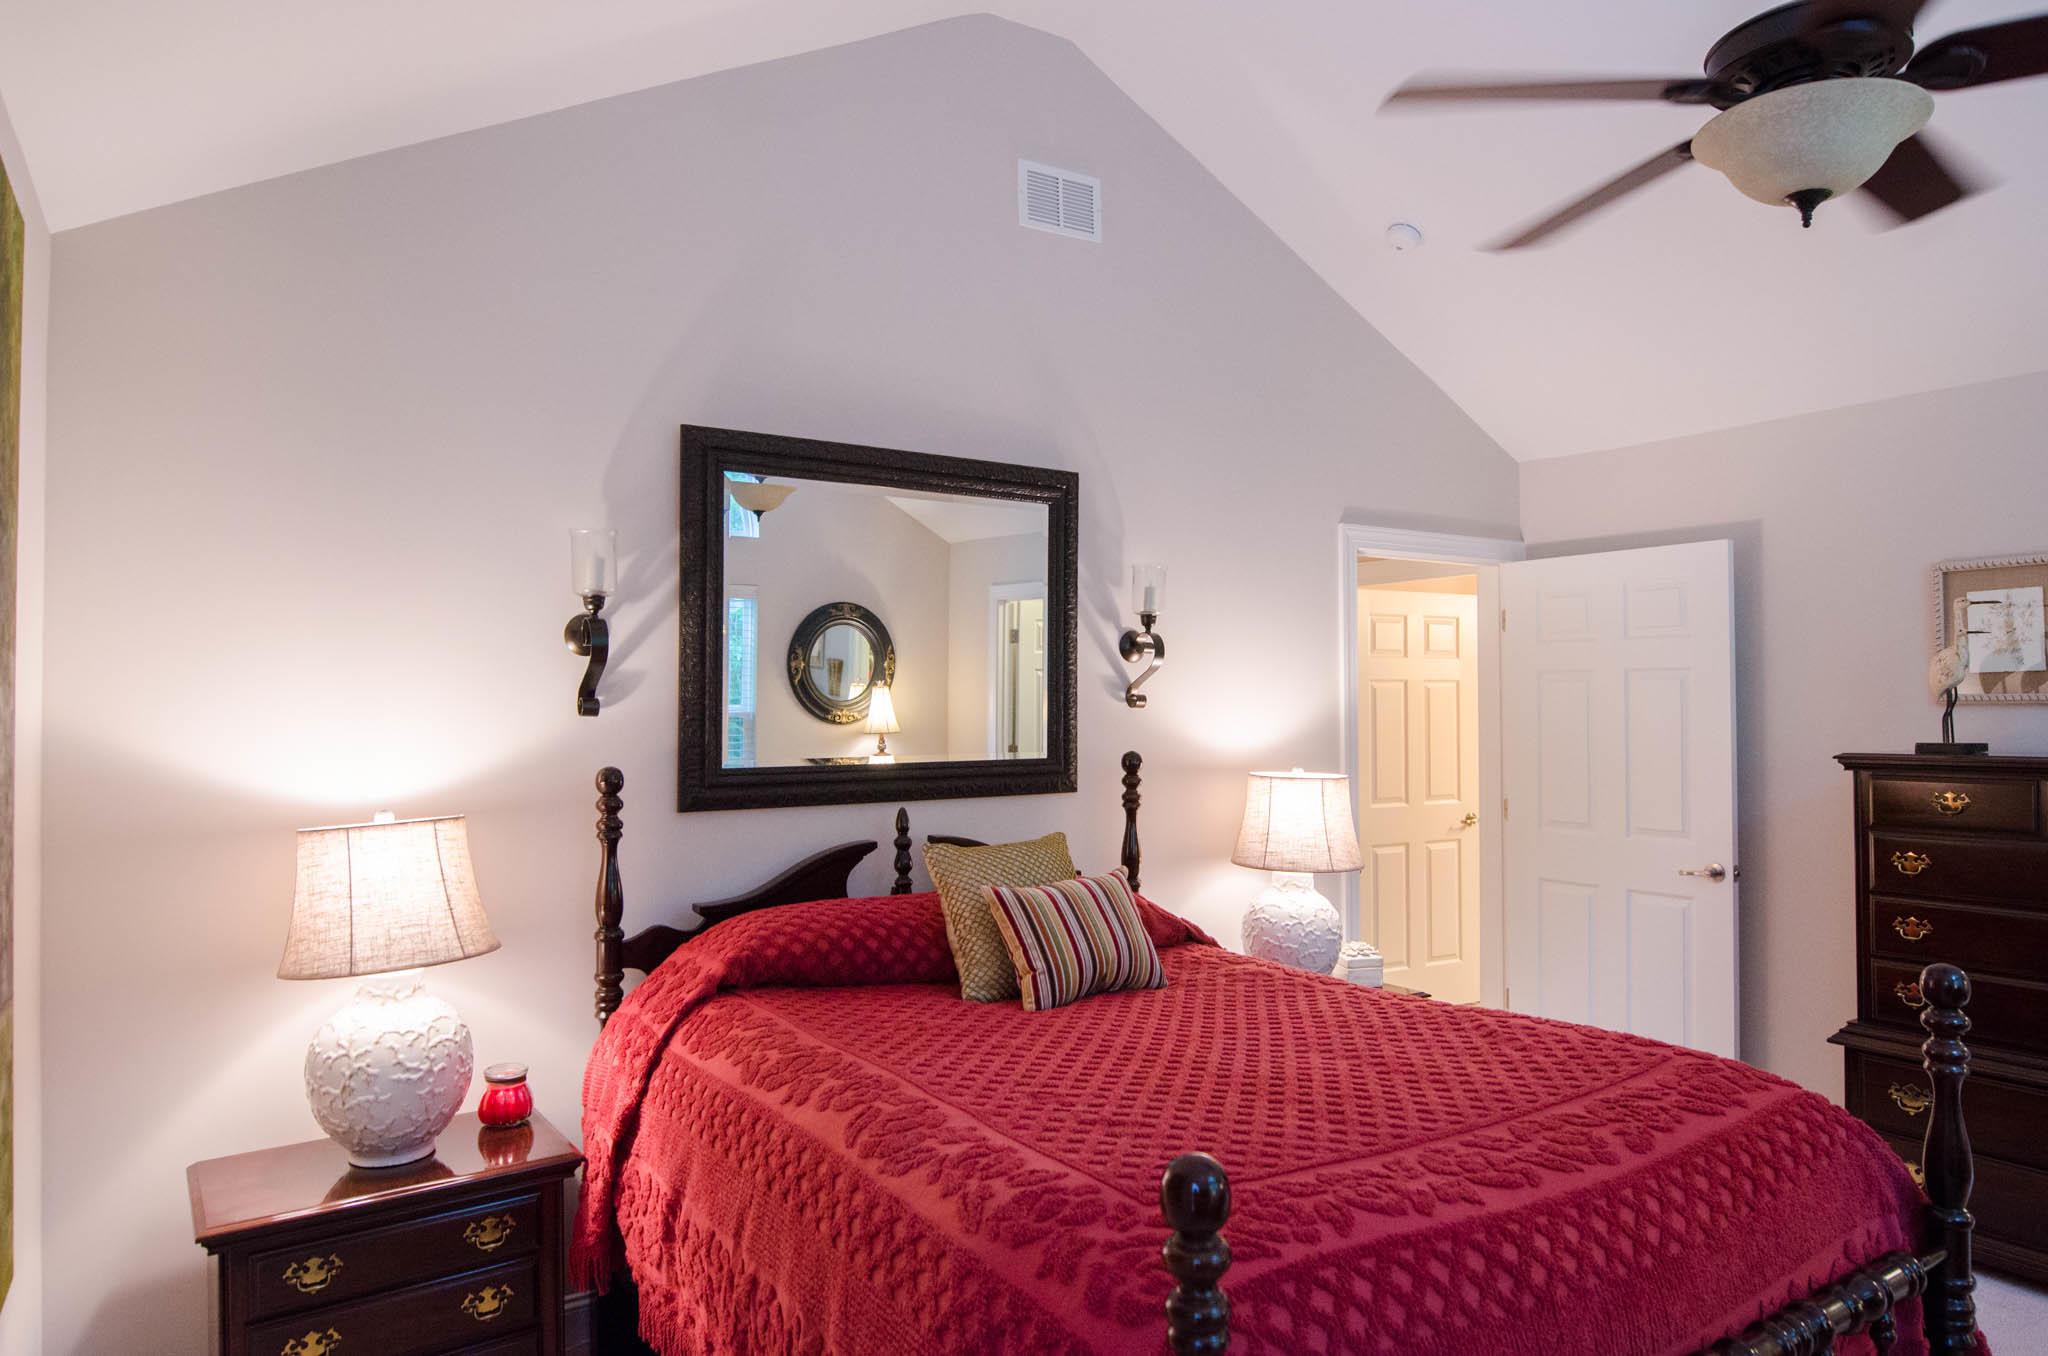 Villas at Charleston Park Homes For Sale - 8800 Dorchester, North Charleston, SC - 0